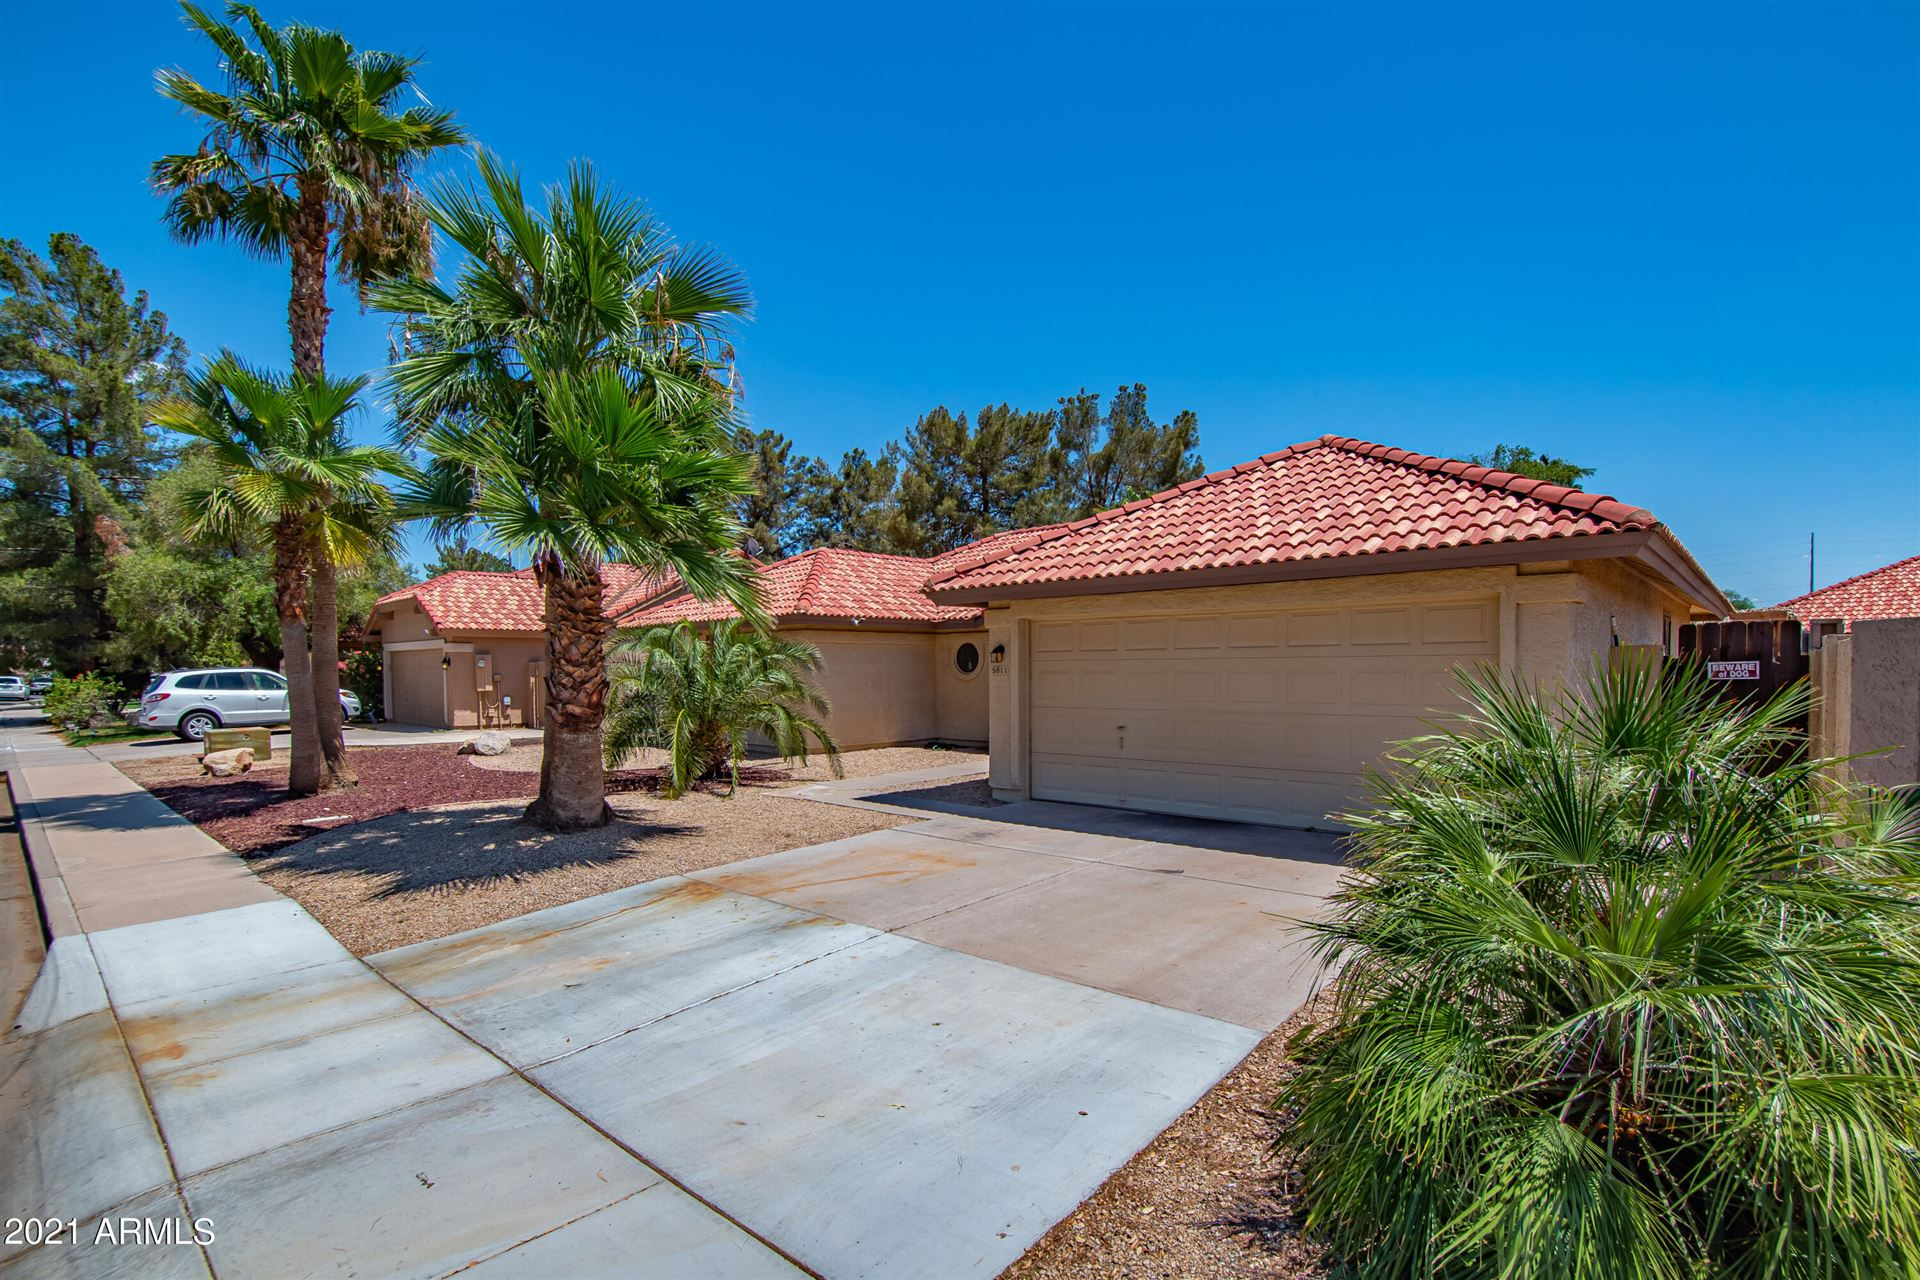 Photo of 5611 W GERONIMO Street, Chandler, AZ 85226 (MLS # 6272749)